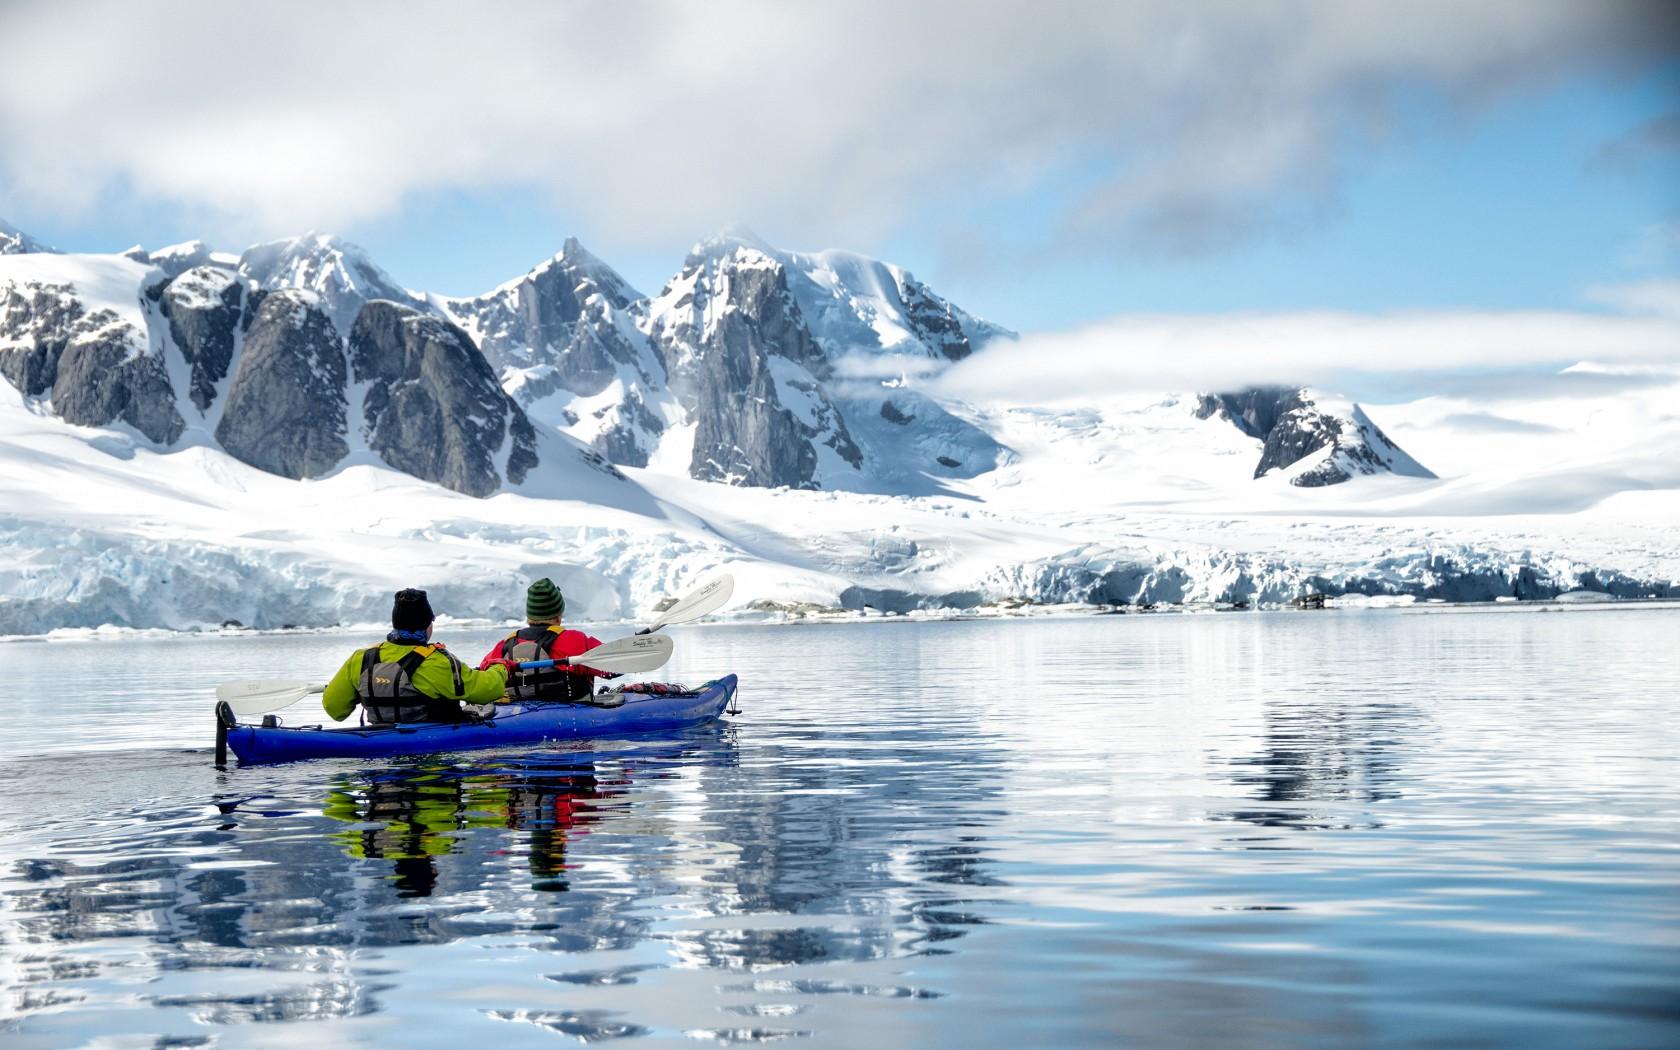 3Edited-Antarctica-DNY8YE-1680x1050